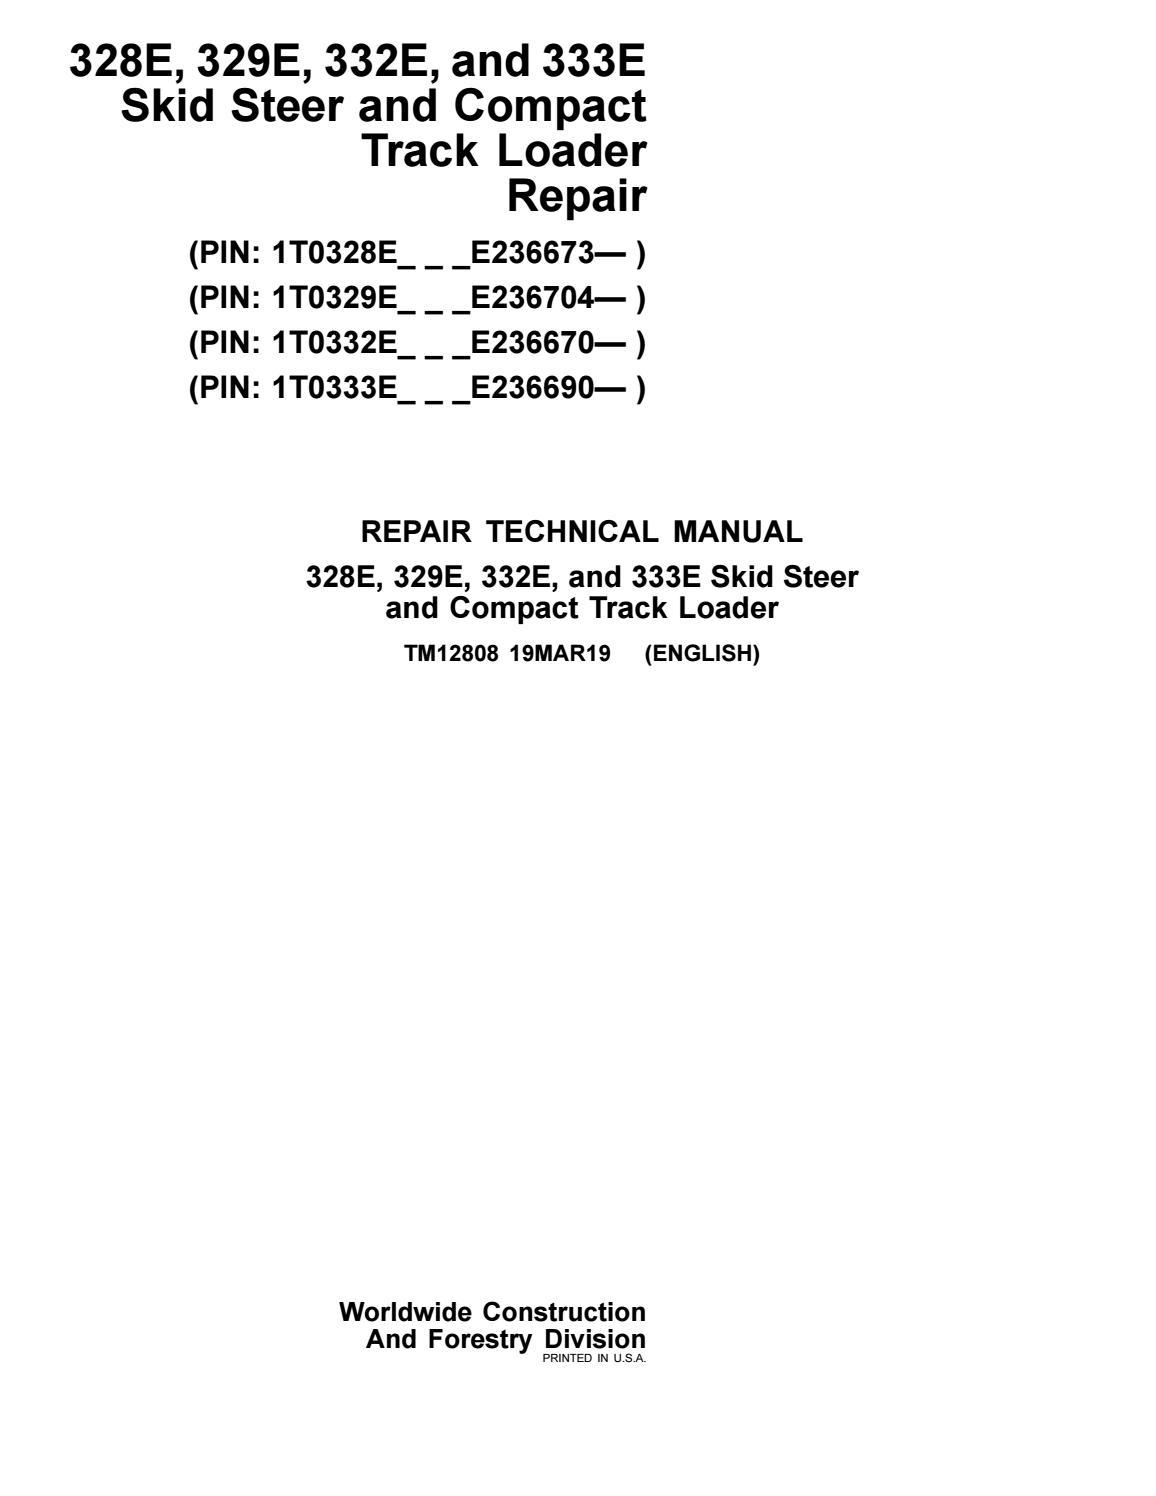 JOHN DEERE 328E 329E 332E 333E SKID STEER LOADER SERVICE REPAIR MANUAL TM12808